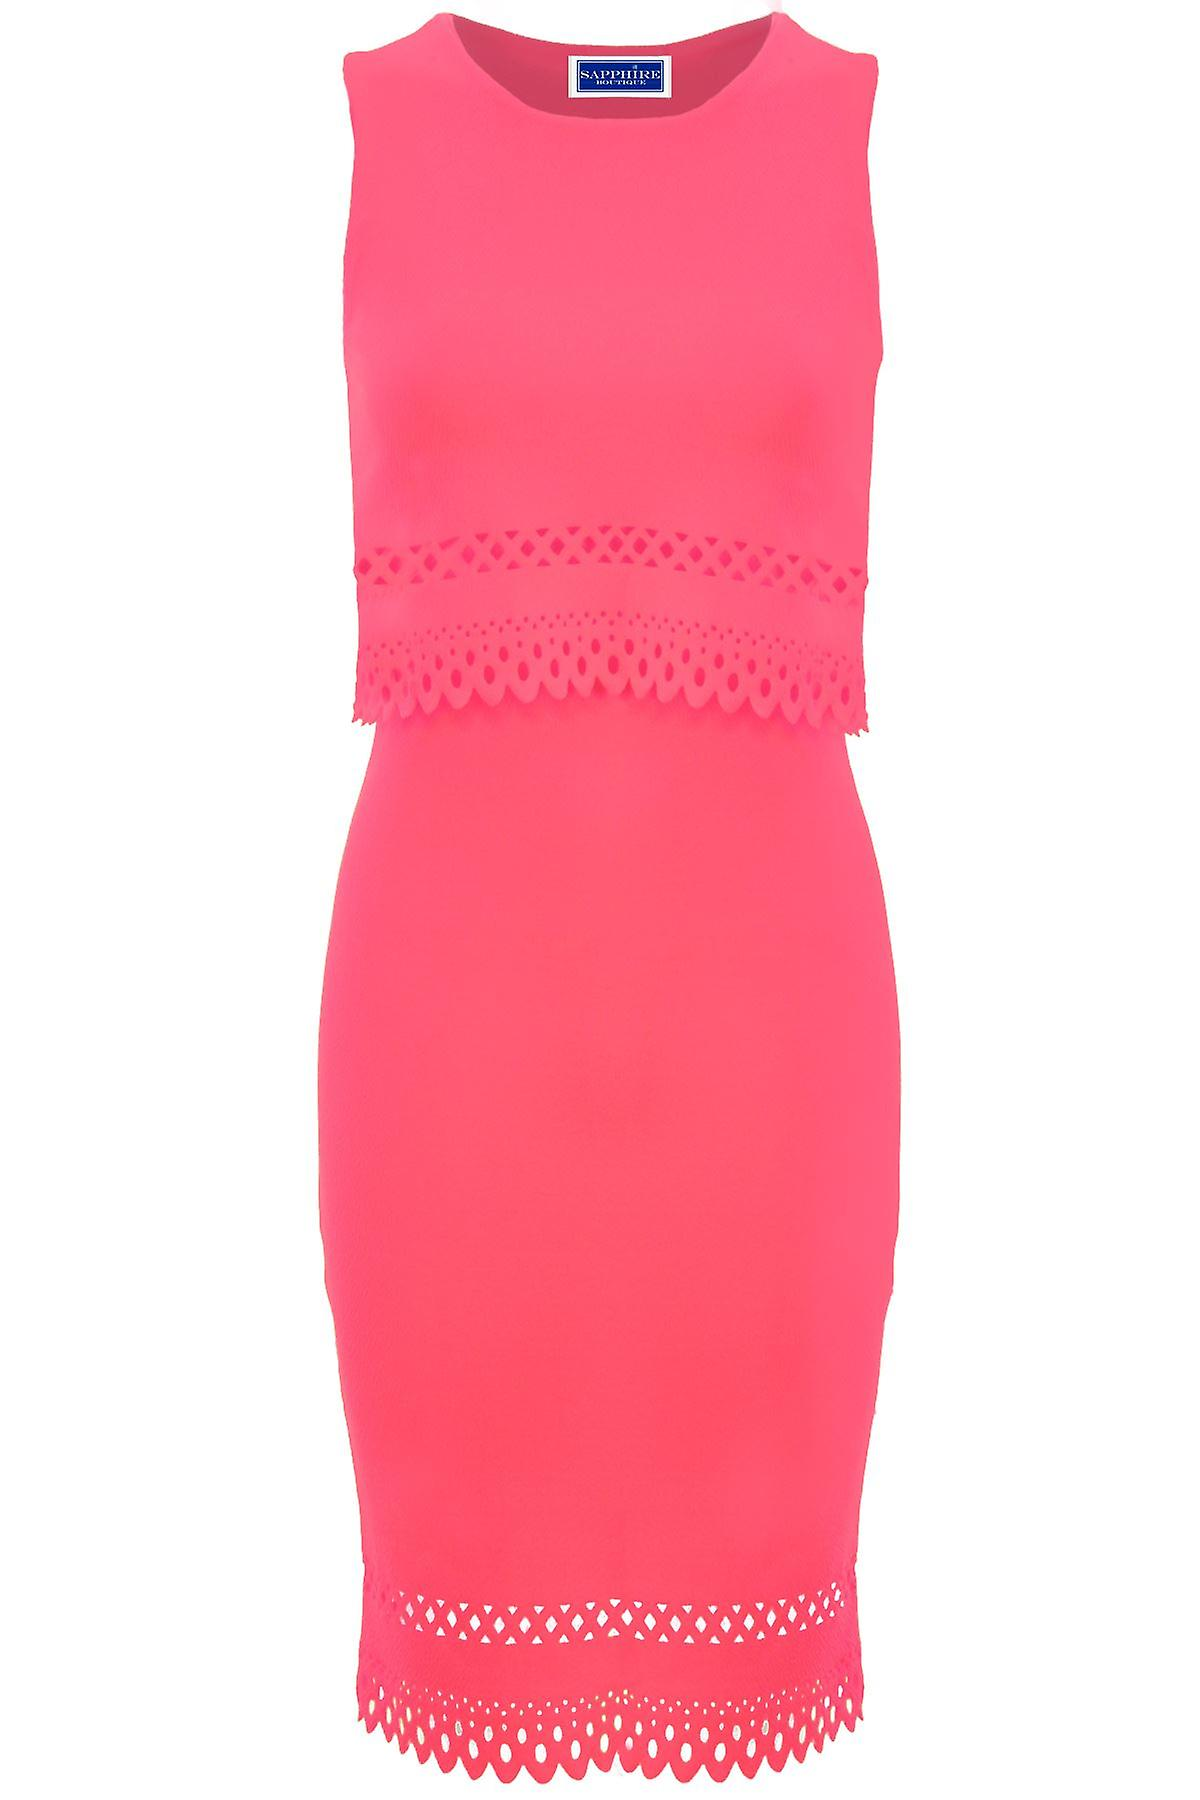 Ladies Overlay Cut Out Scallop Hem Crepe Midi Knee Length Neon Bodycon Dress